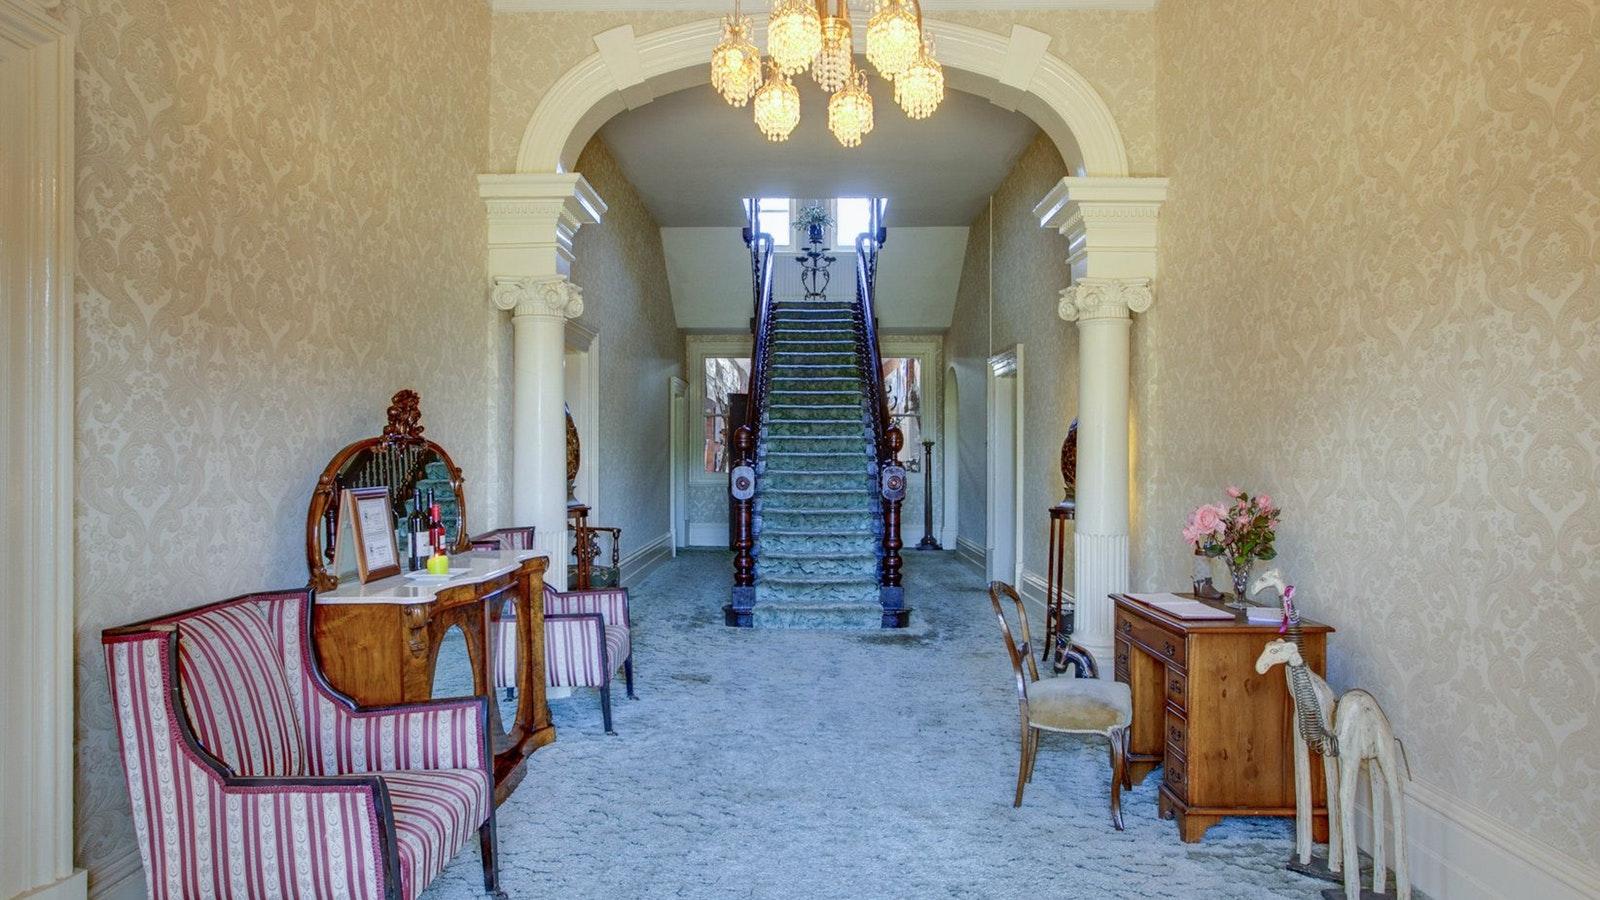 Highton Manor interior